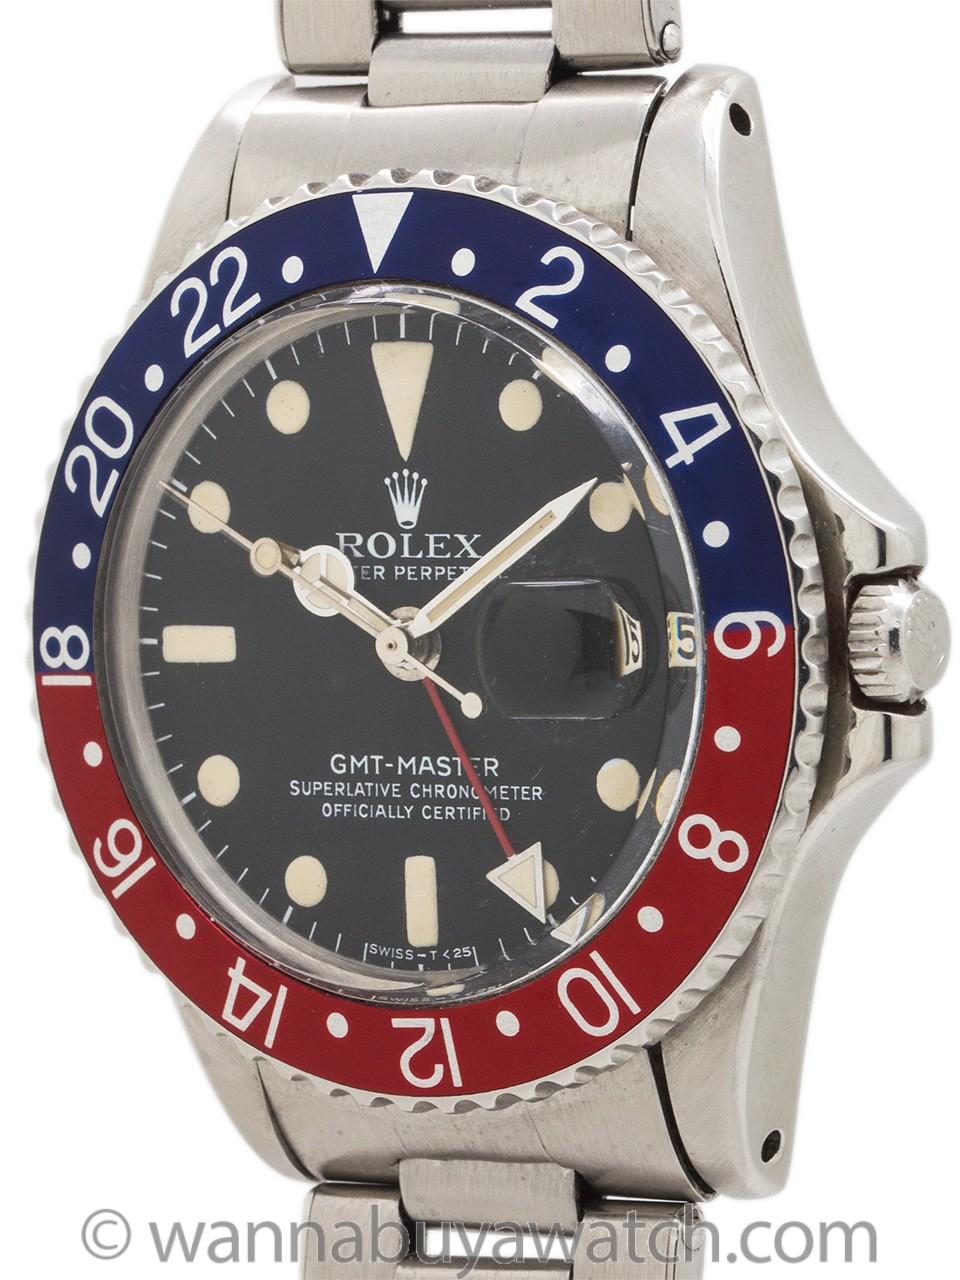 Rolex SS GMT-Master ref 1675 circa 1966